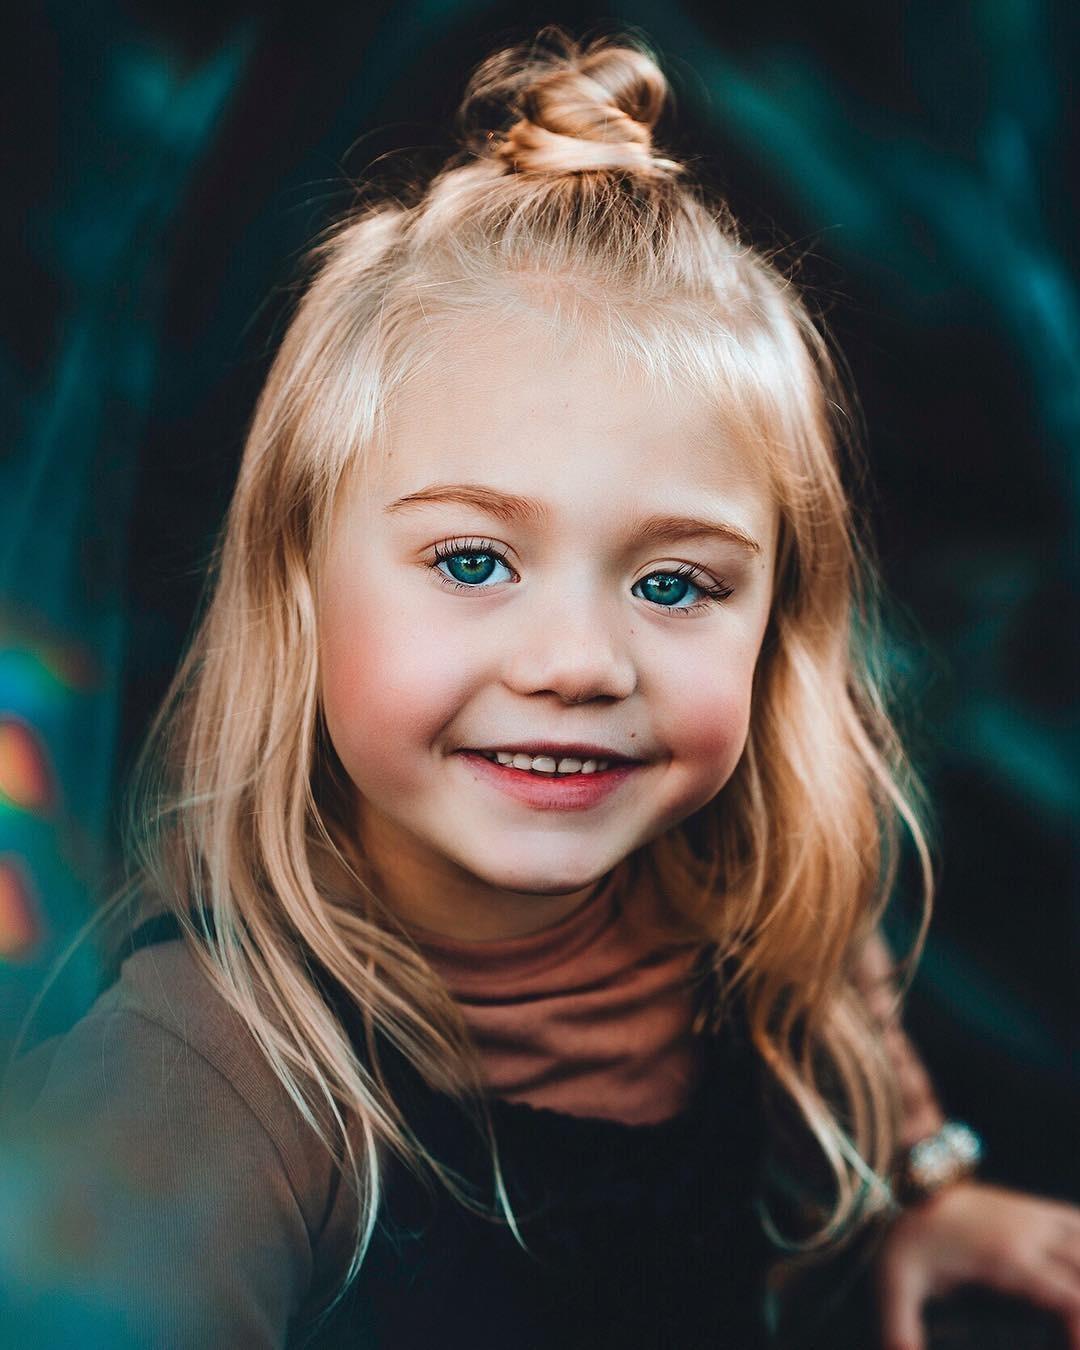 Everleigh Soutas has a small bun on her head. She has blonde hair and blue eyes. She is very cute.